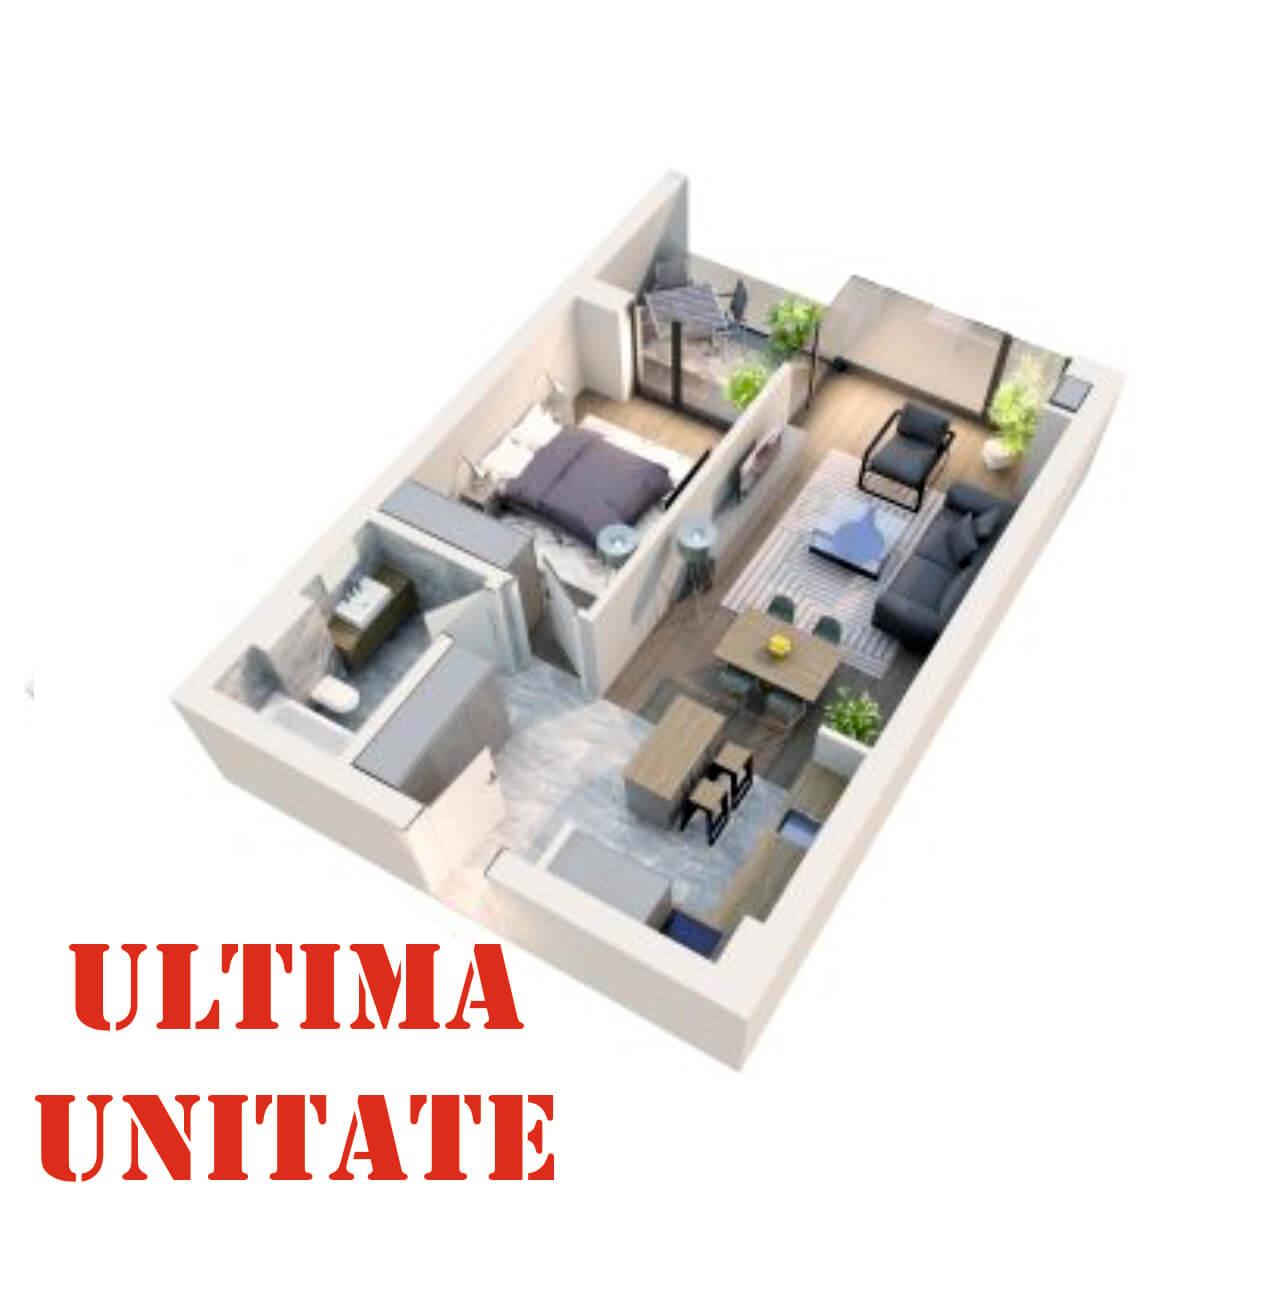 Apartament 2 camere tip 2D1′ Logie | Etaj 5-6 | Corp C8 | Faza 2